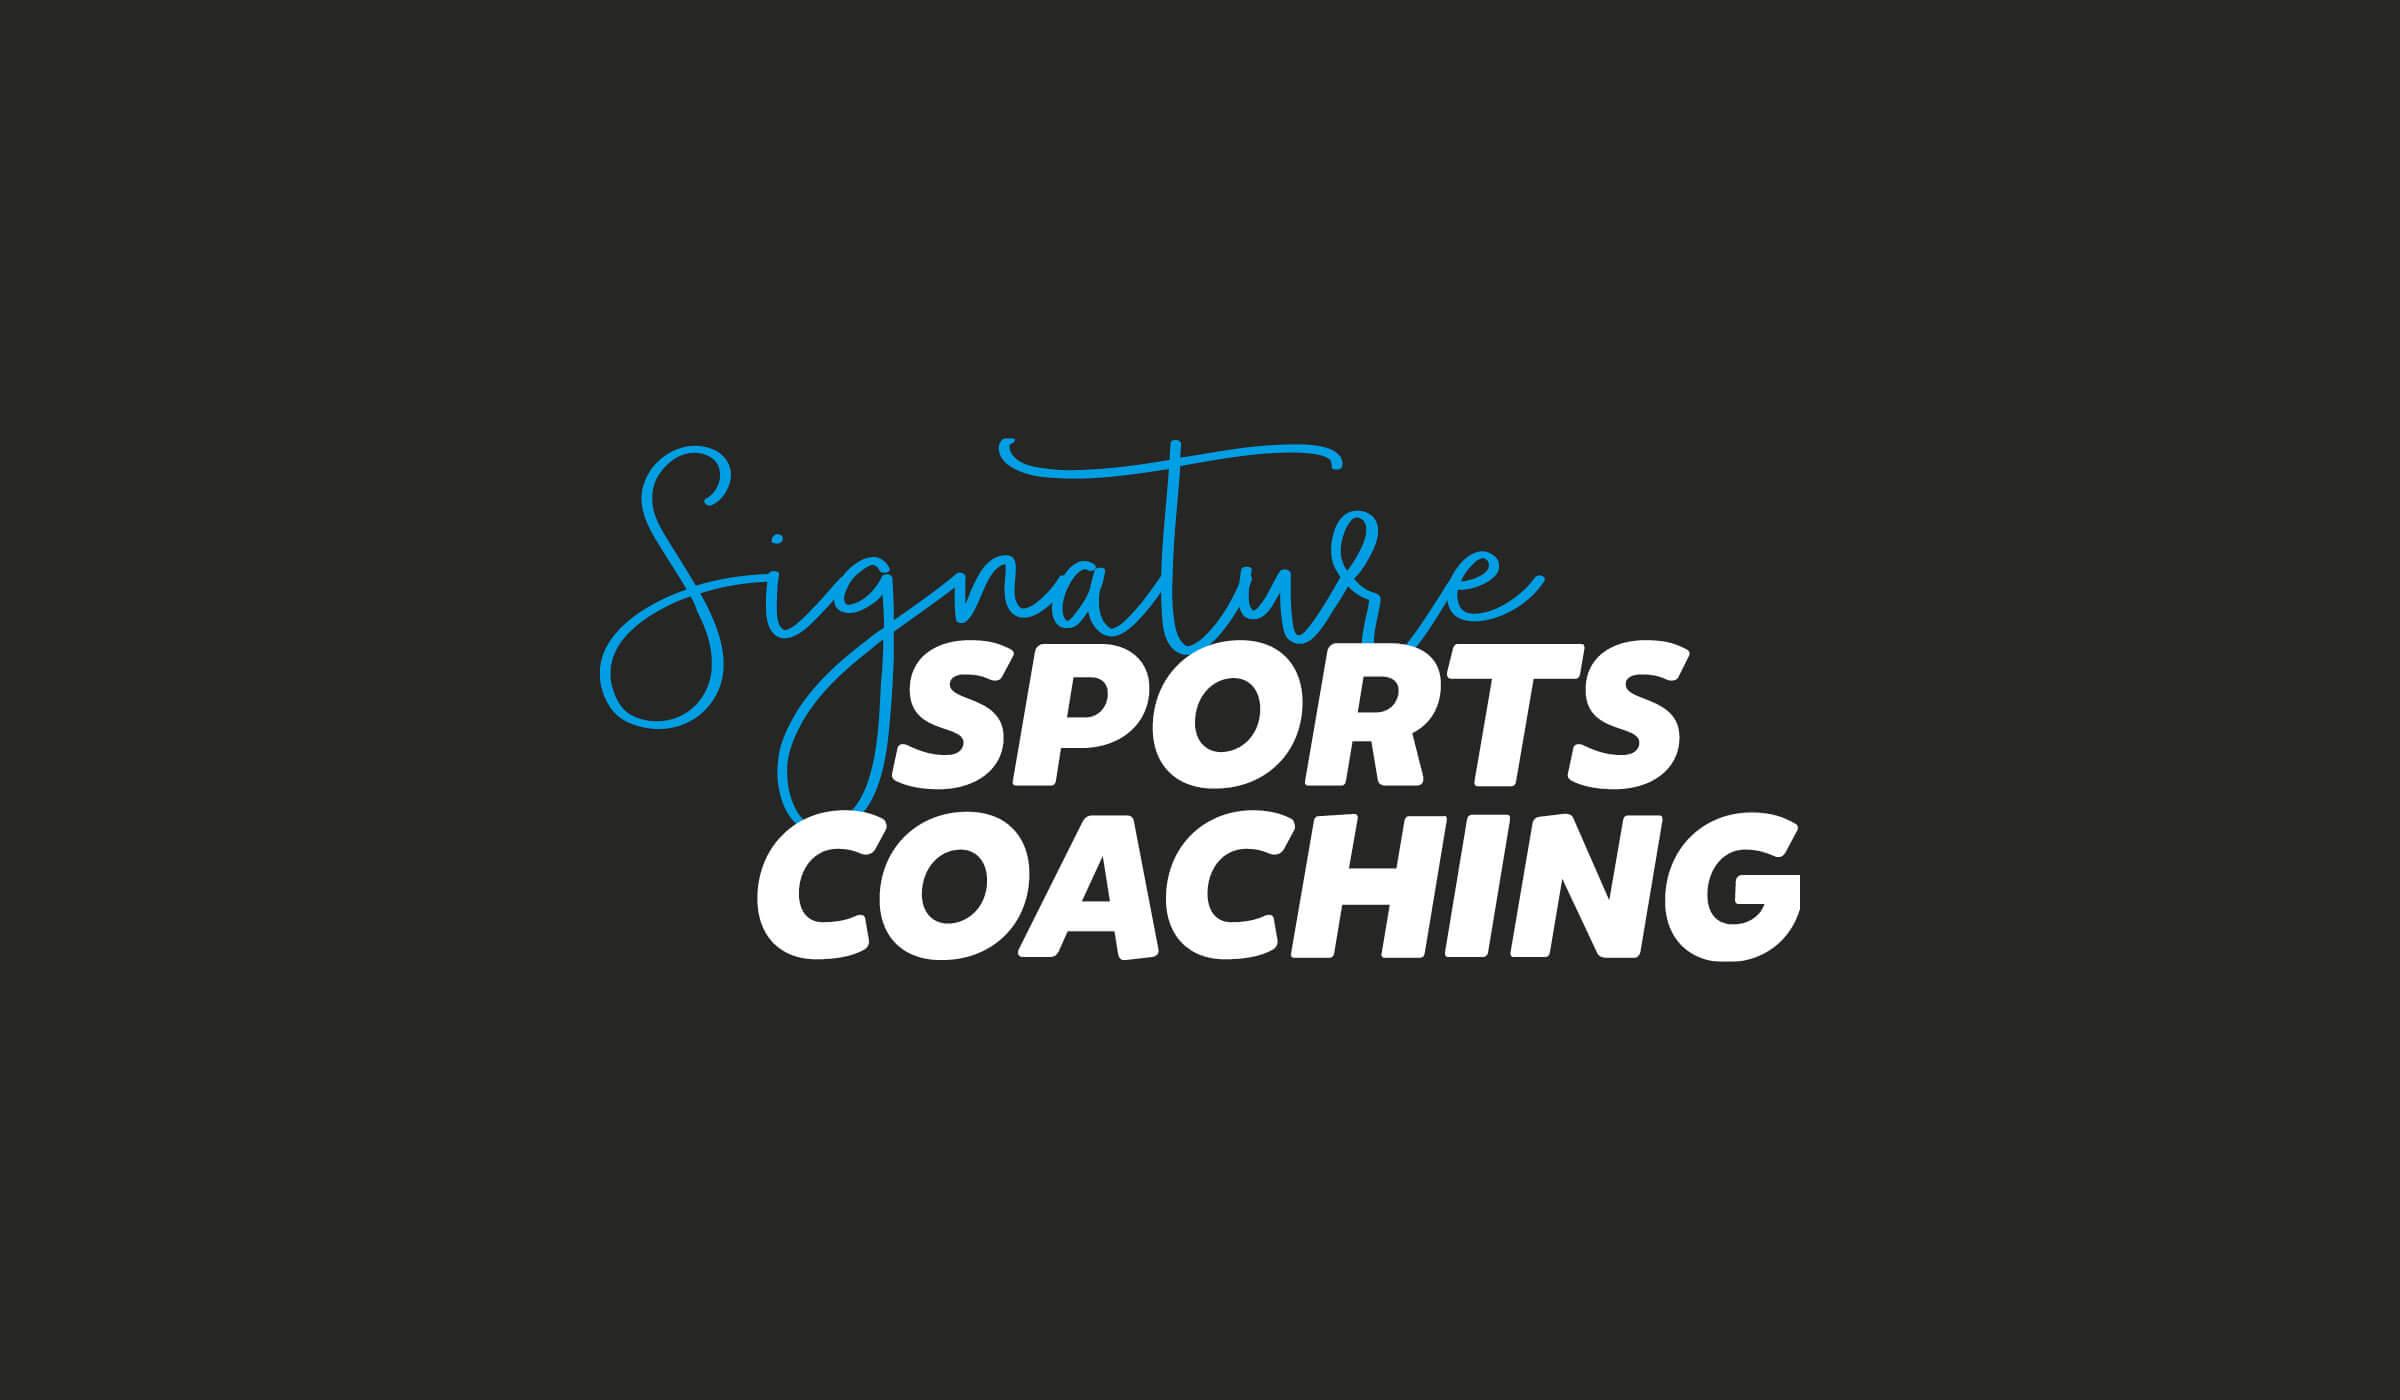 Bristol sports coach logo design